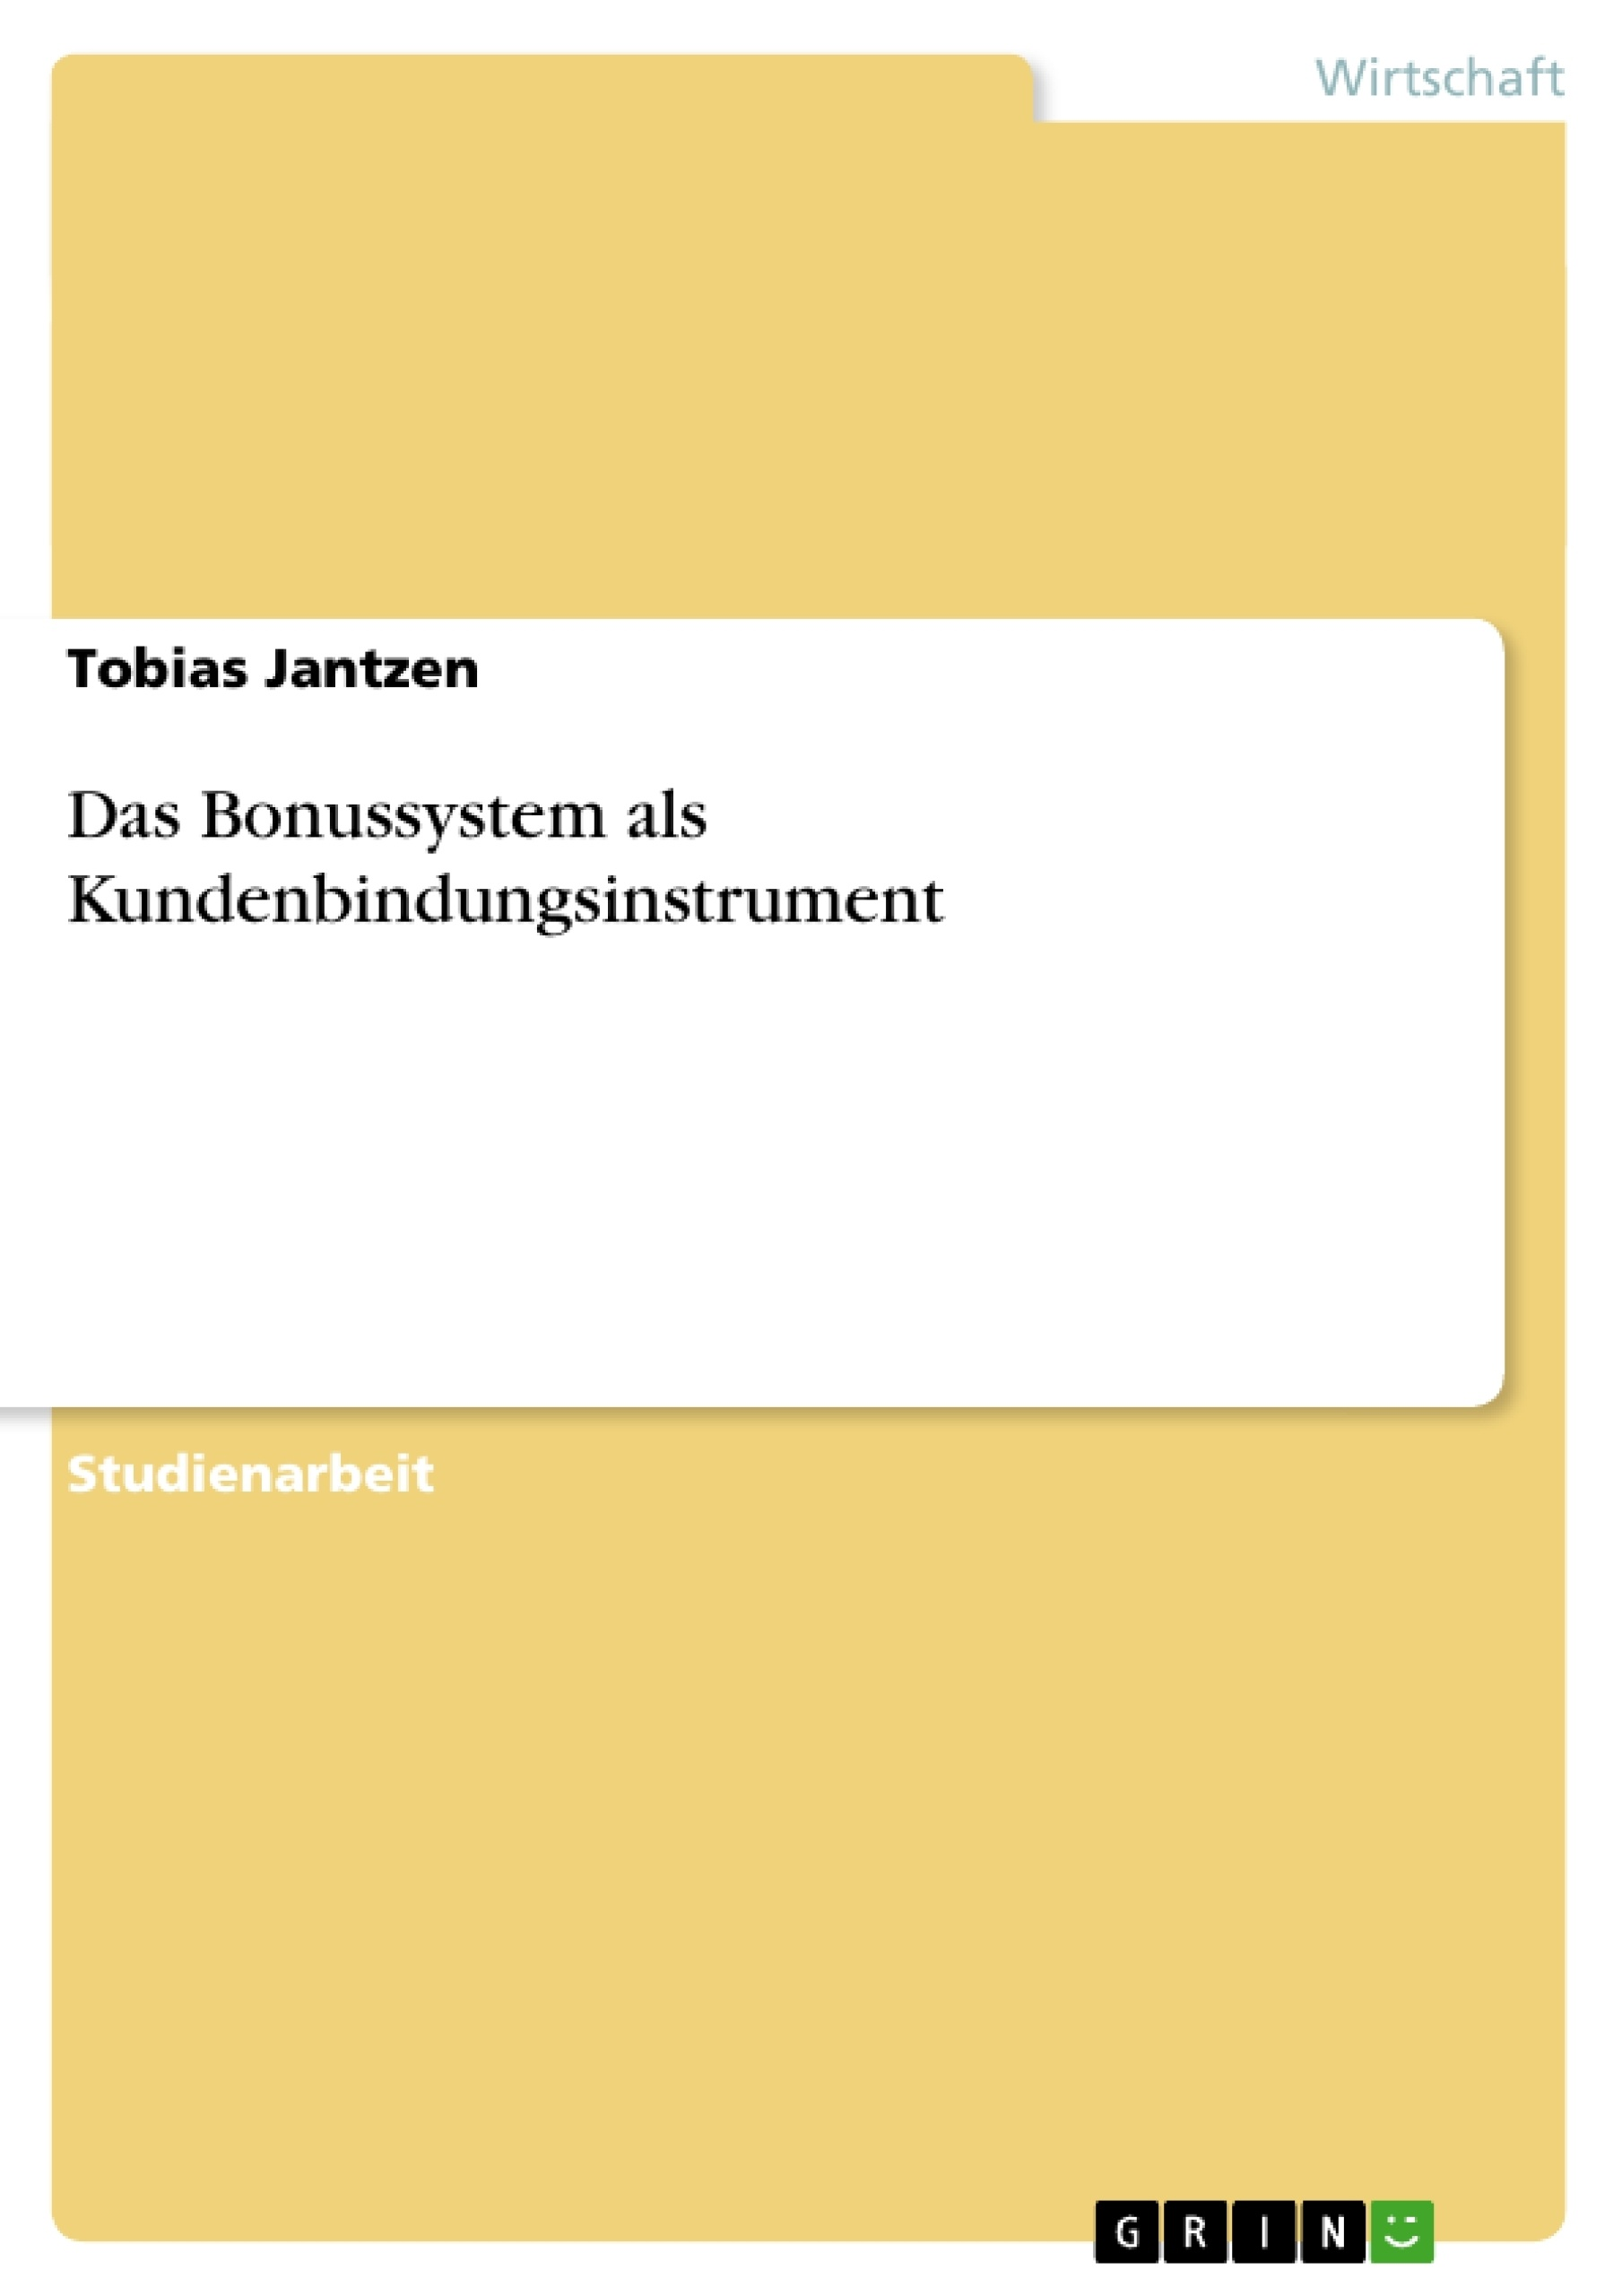 Titel: Das Bonussystem als Kundenbindungsinstrument